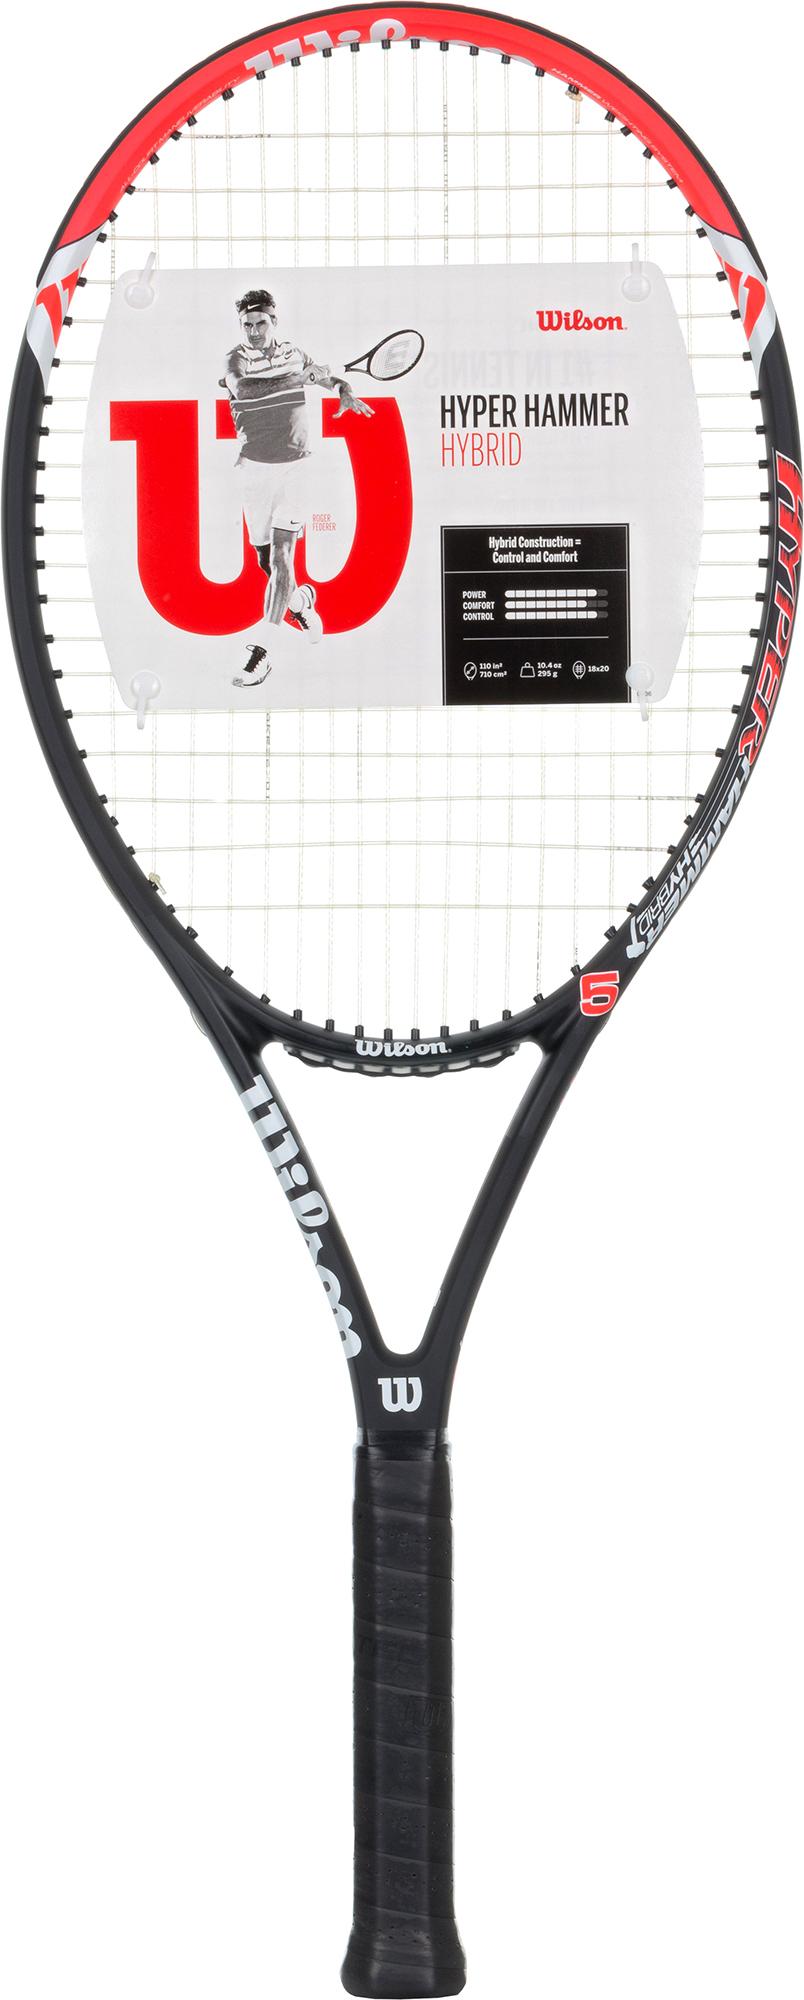 Wilson Ракетка для большого тенниса Wilson Hyper Hammer 5 HYB, размер 3 wilson ракетка для большого тенниса детская wilson roger federer 23 размер без размера